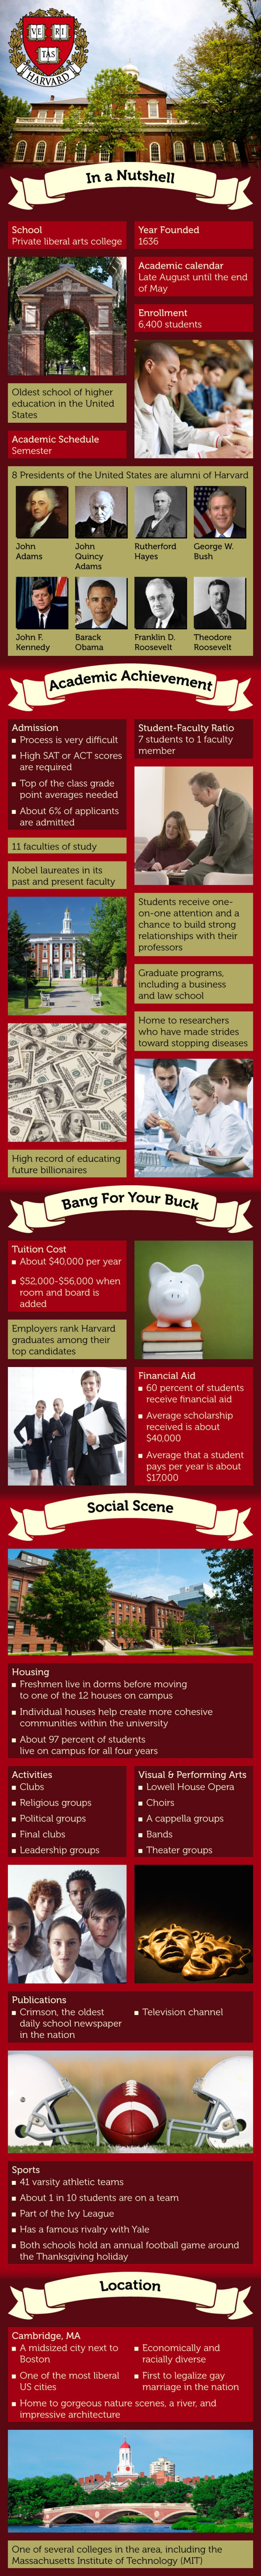 Harvard University Infographic